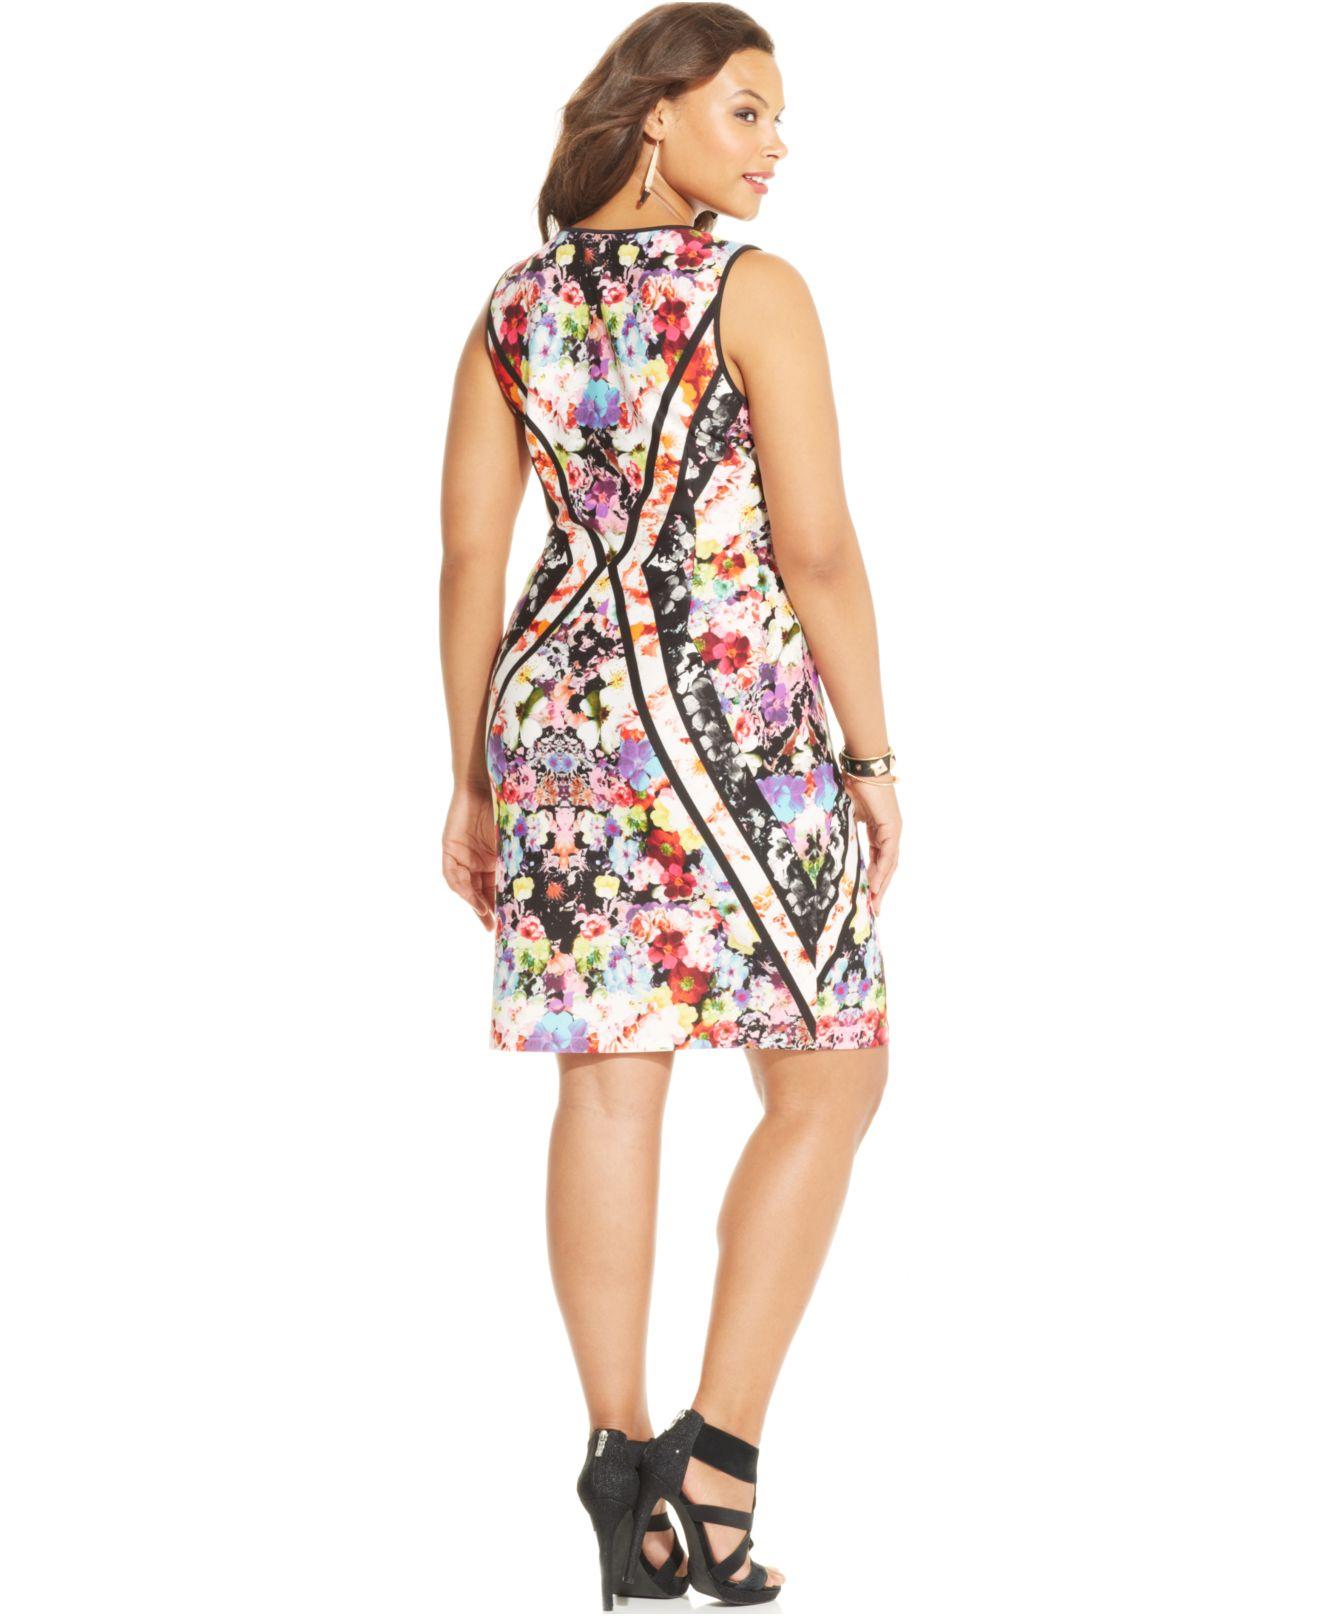 10237580ea4 Lyst - Spense Plus Size Floral-Print Sheath Dress